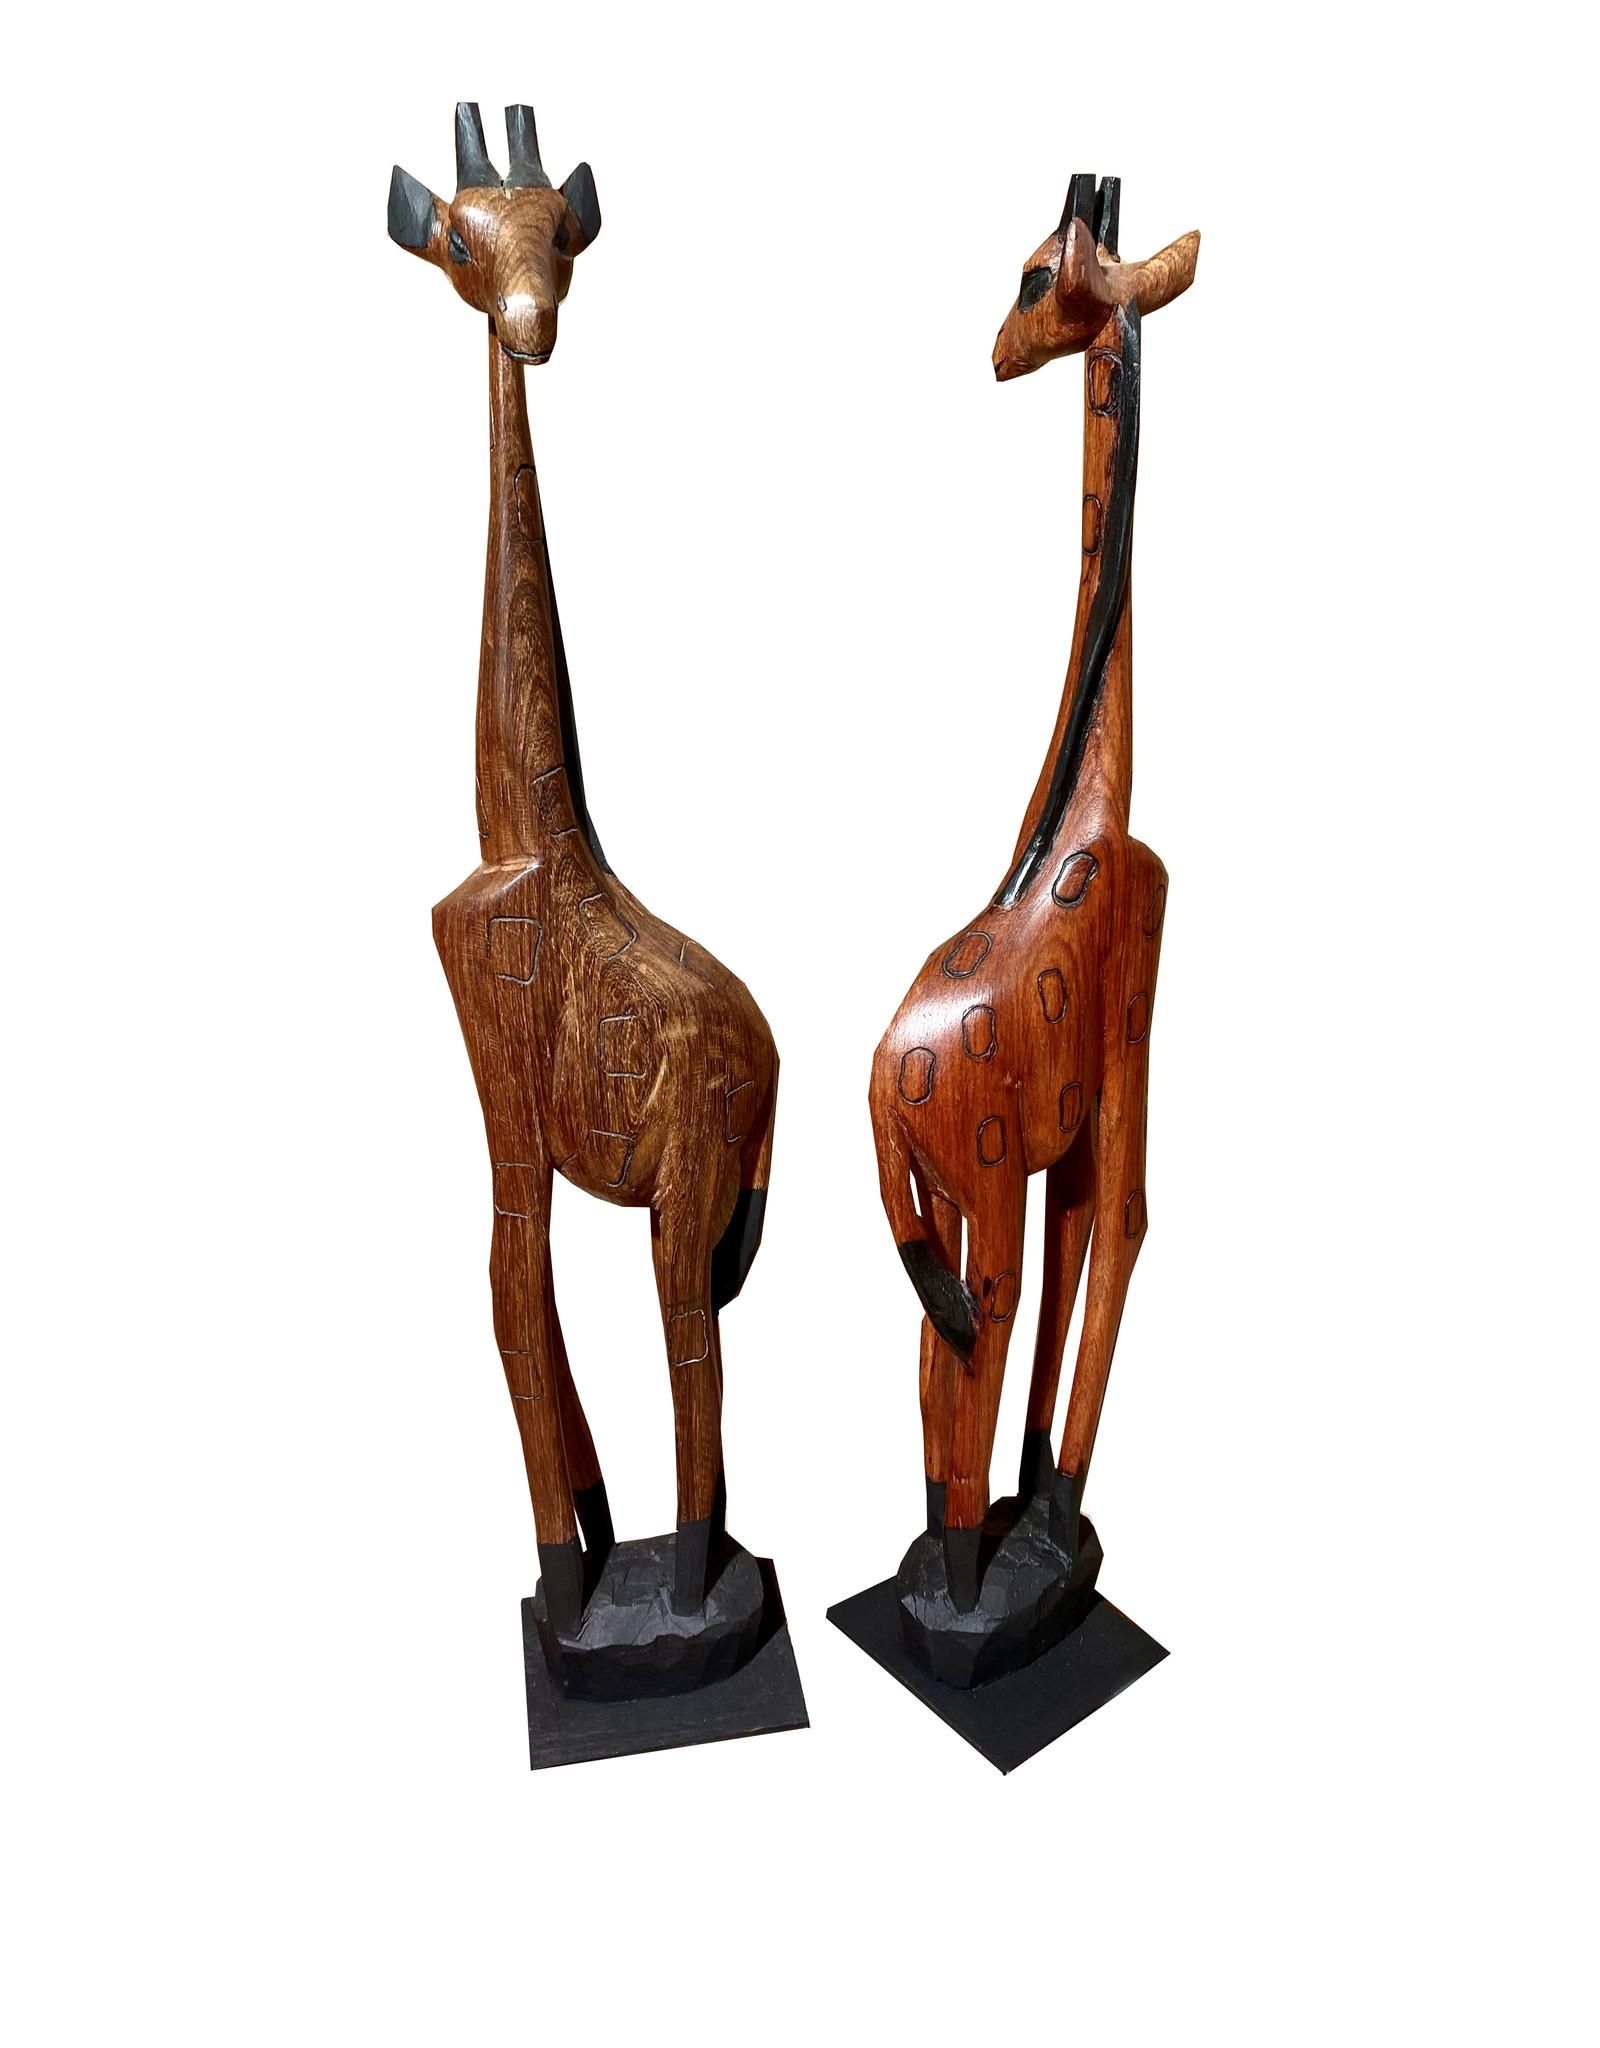 Holzgiraffe aus Afrika 60cm